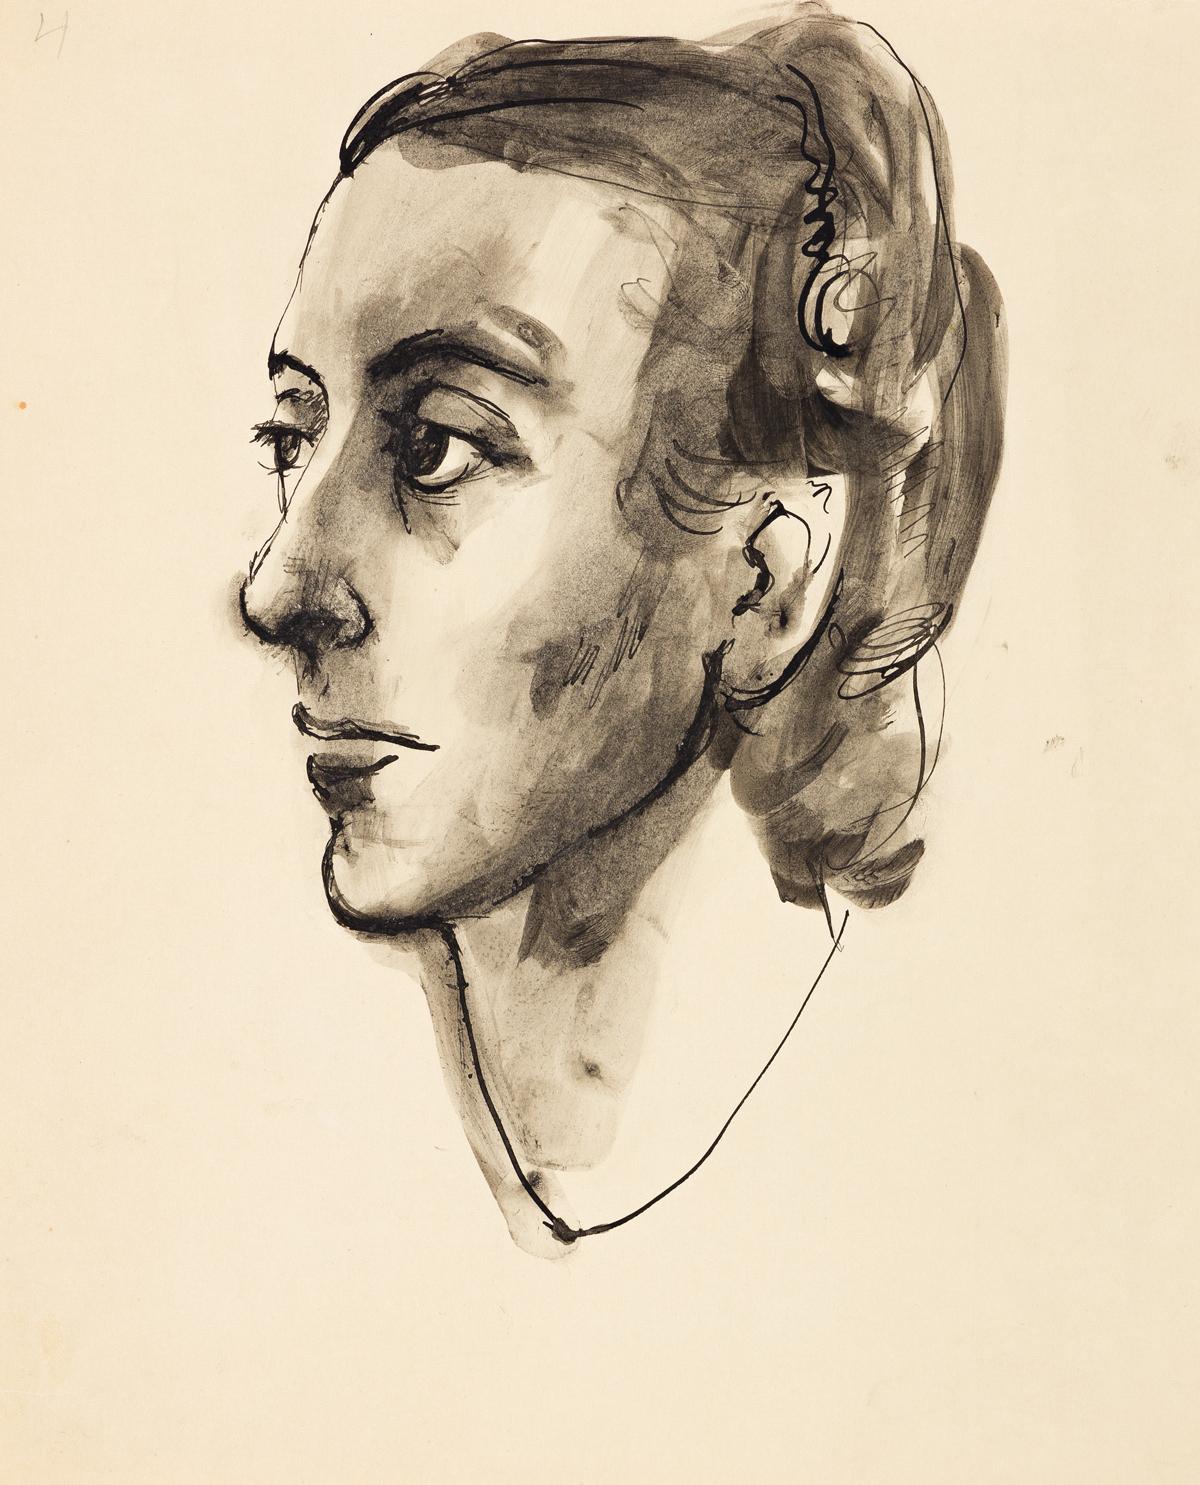 PAVEL TCHELITCHEW (1898-1957) Portrait of Mrs. Oliver Jennings (Mary Brewster Jennings).